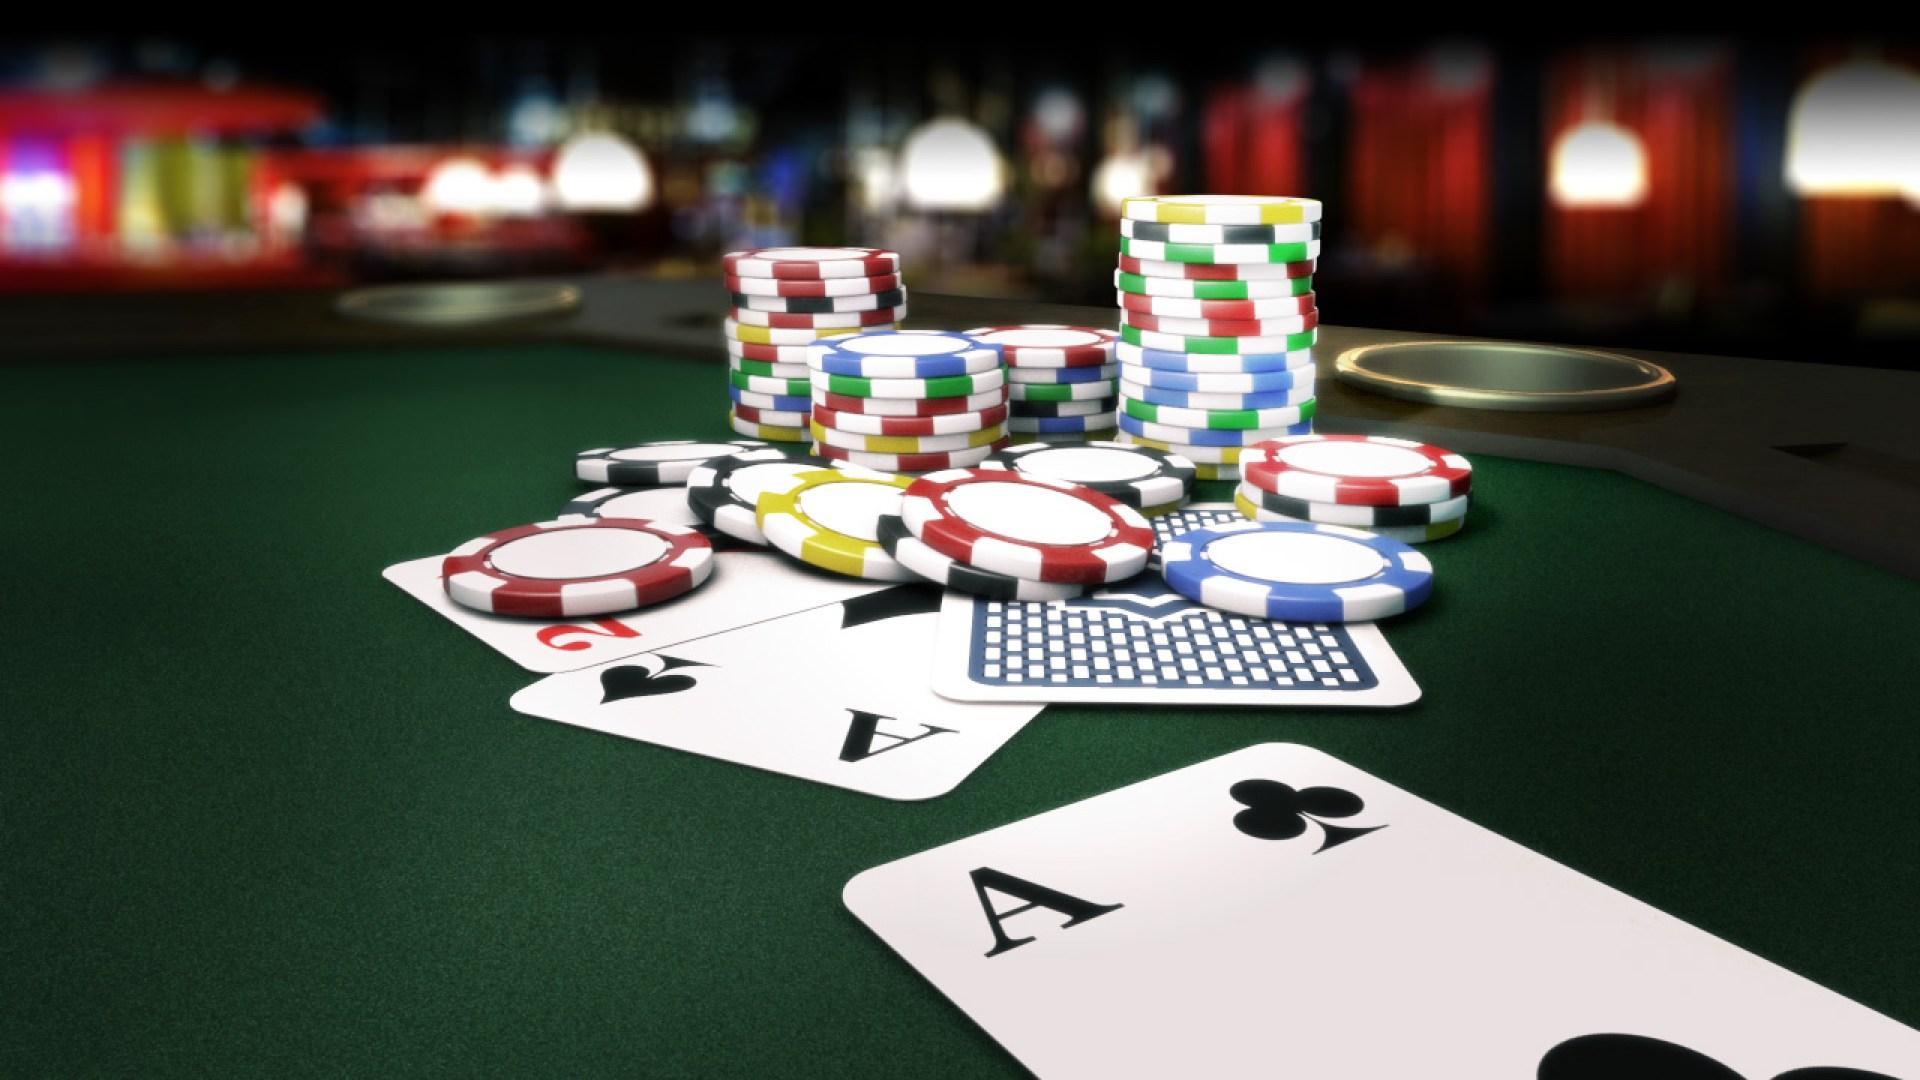 Cara-Memulai-Bermain-Permain-Poker-di-W88